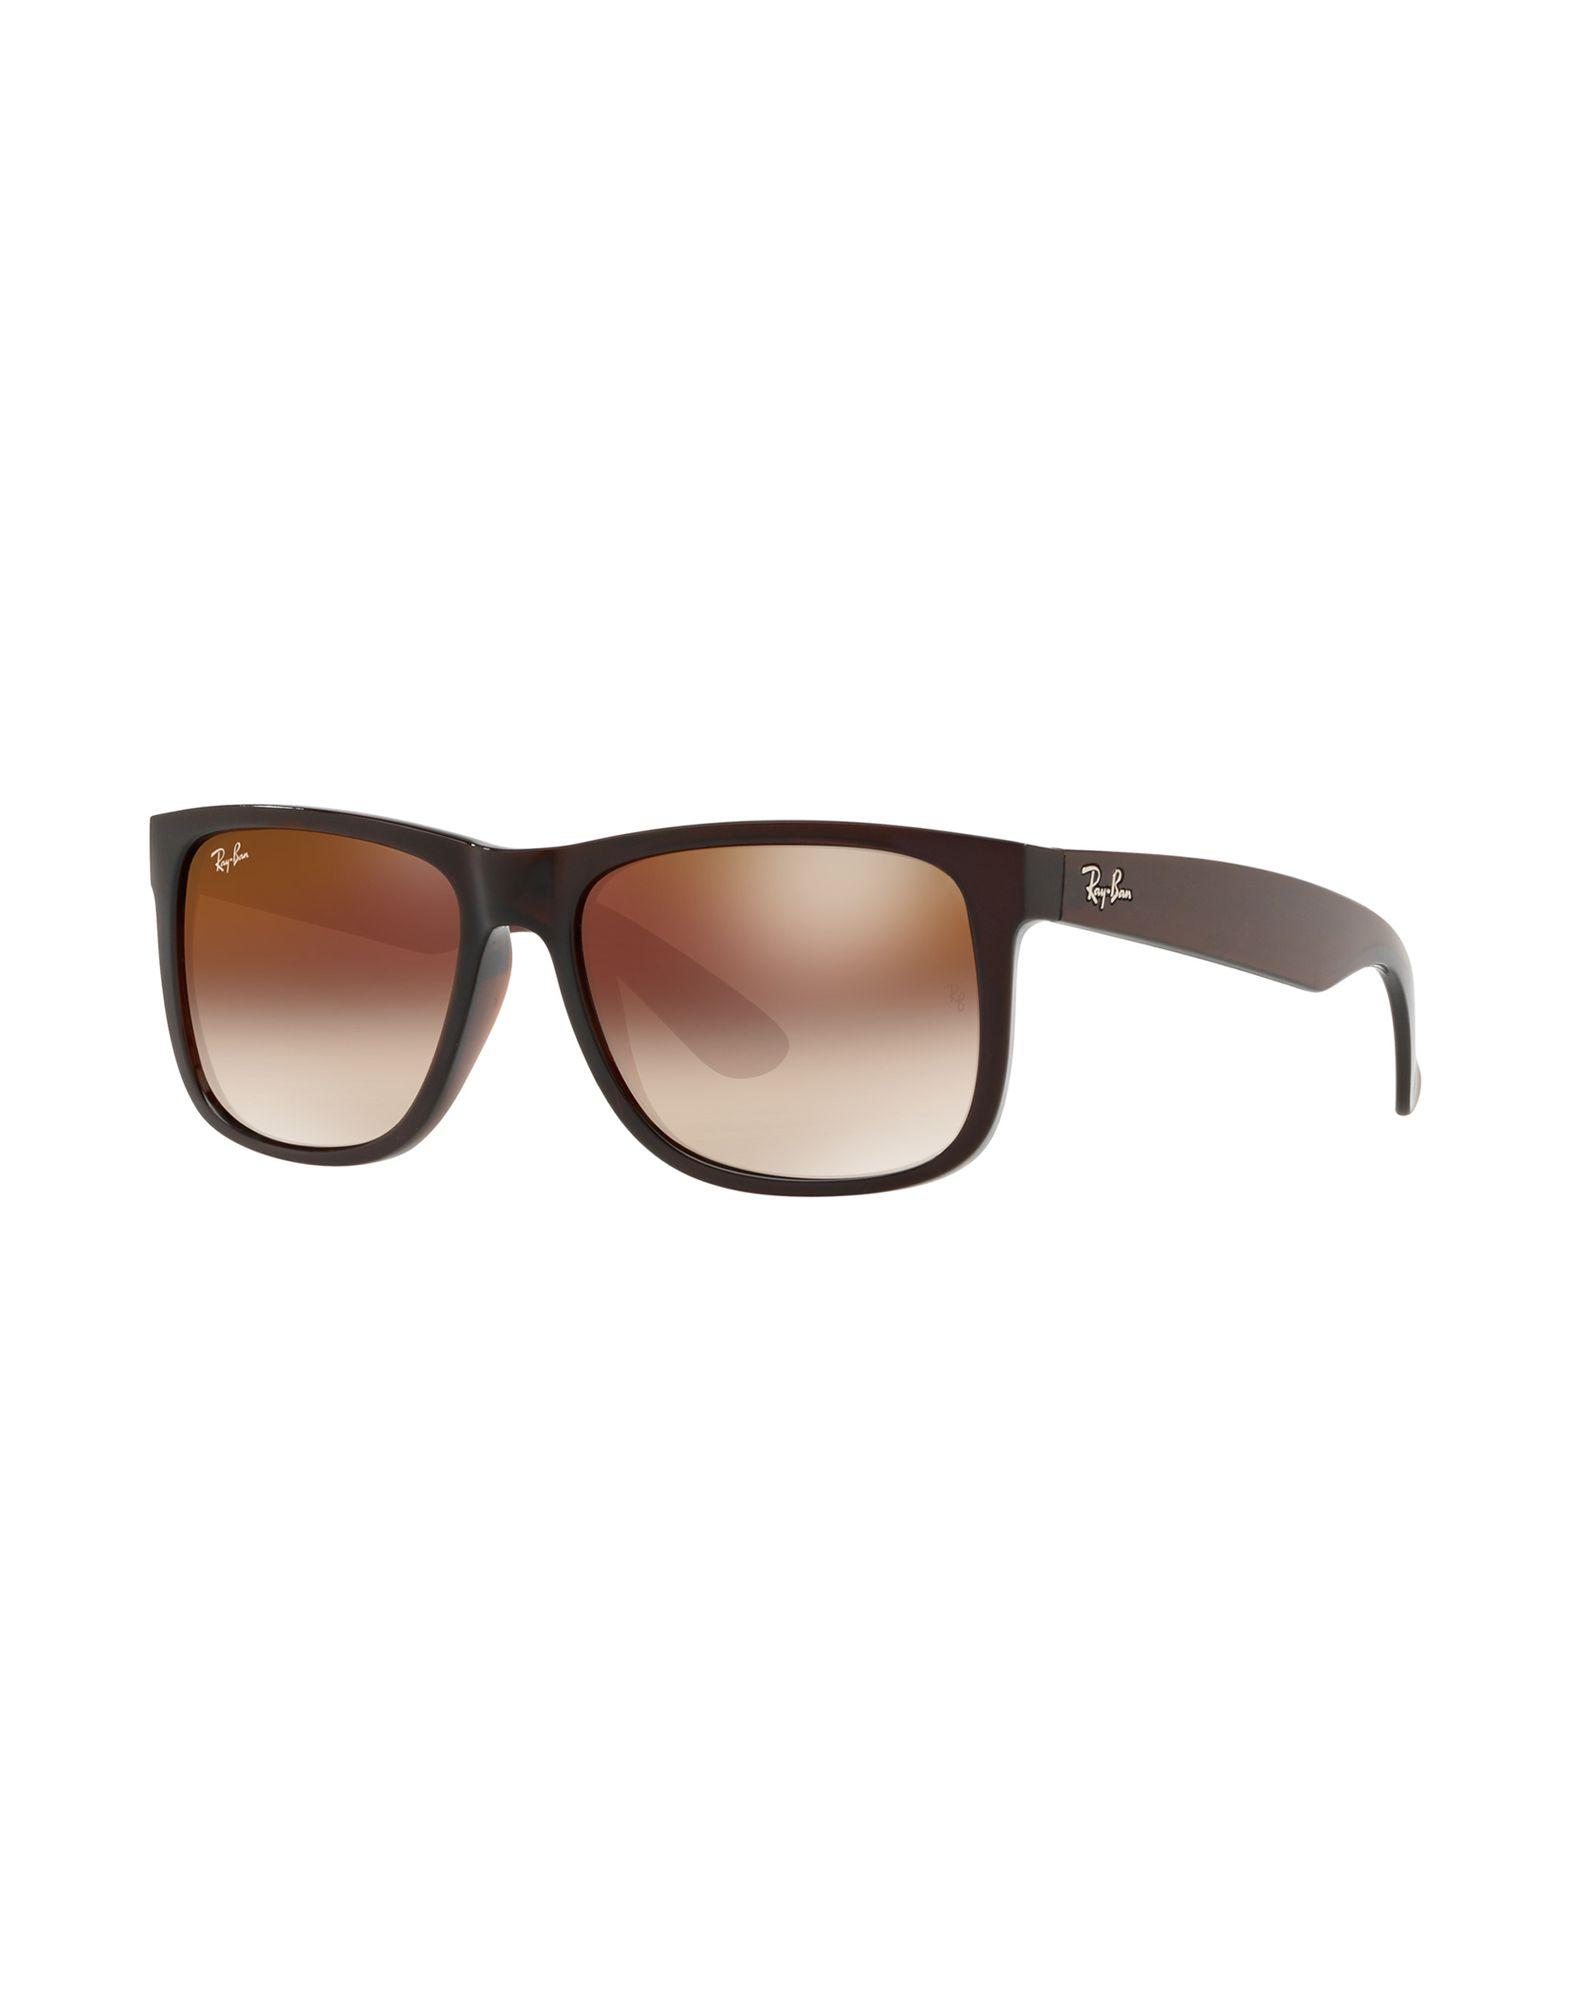 RAY-BAN Солнечные очки солнцезащитные очки ray ban rayban rb 3362 001